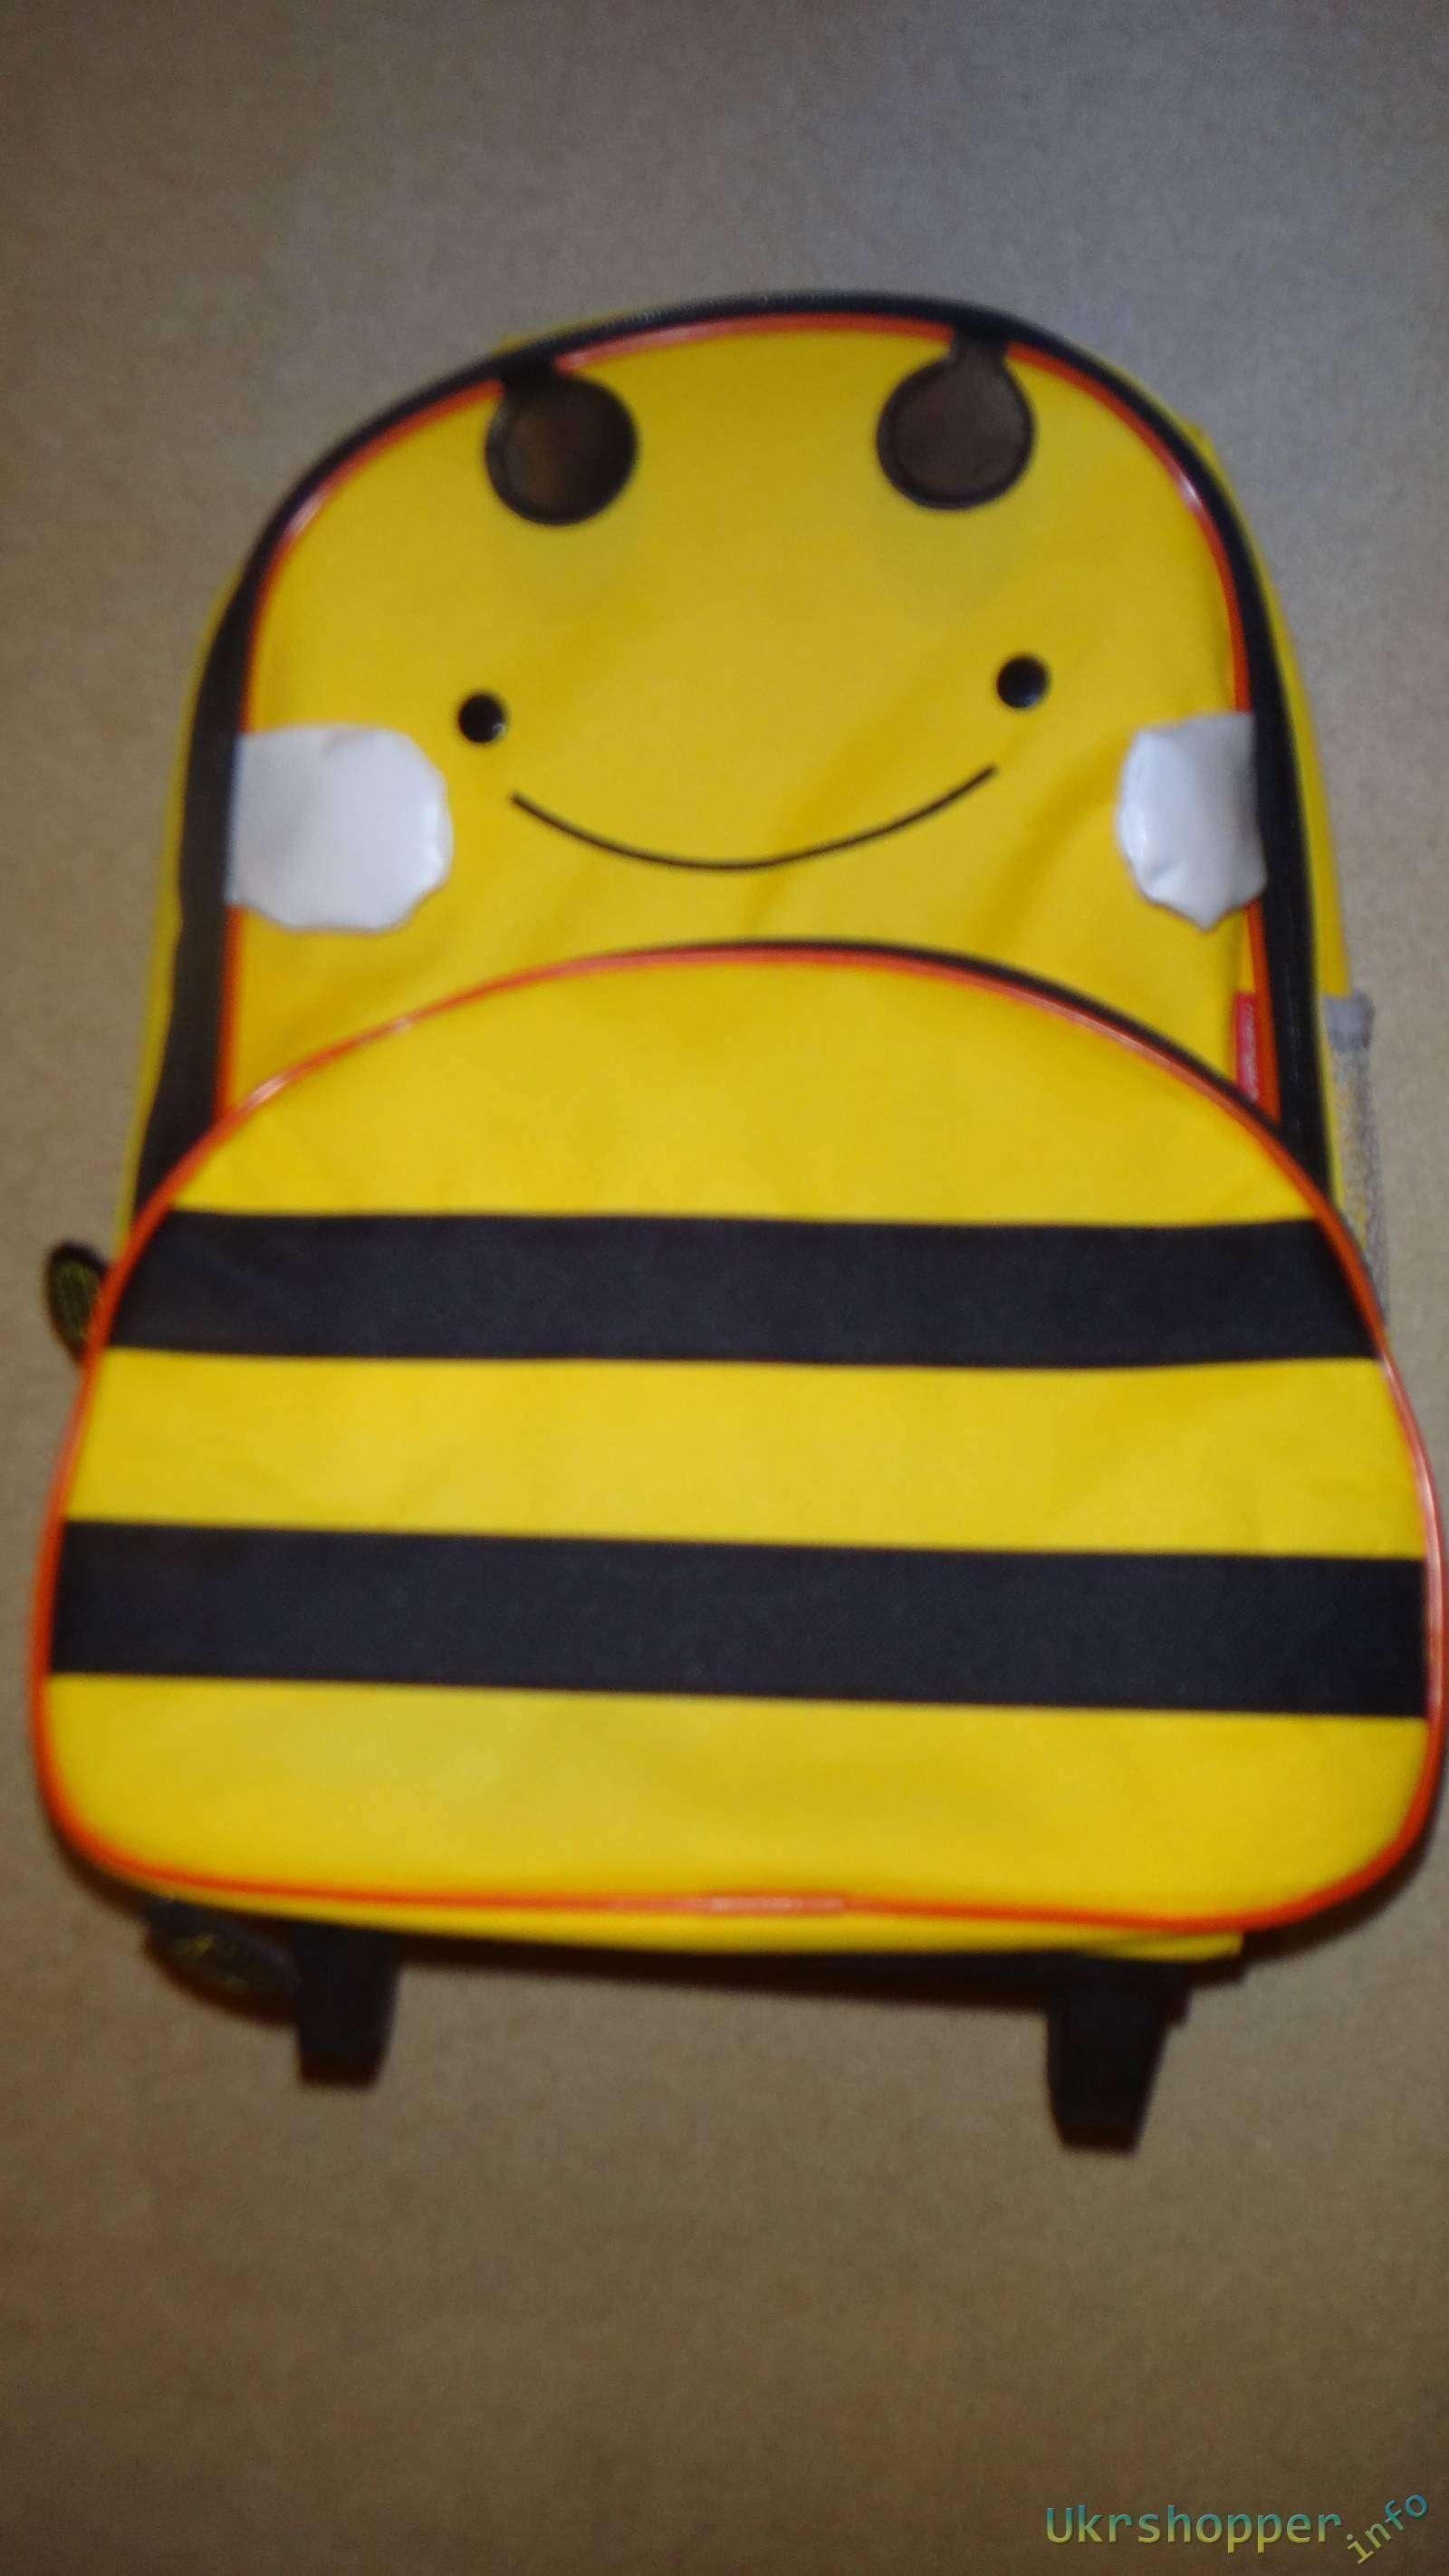 EachBuyer: Обзор детского чемодана-рюкзака для путешествий